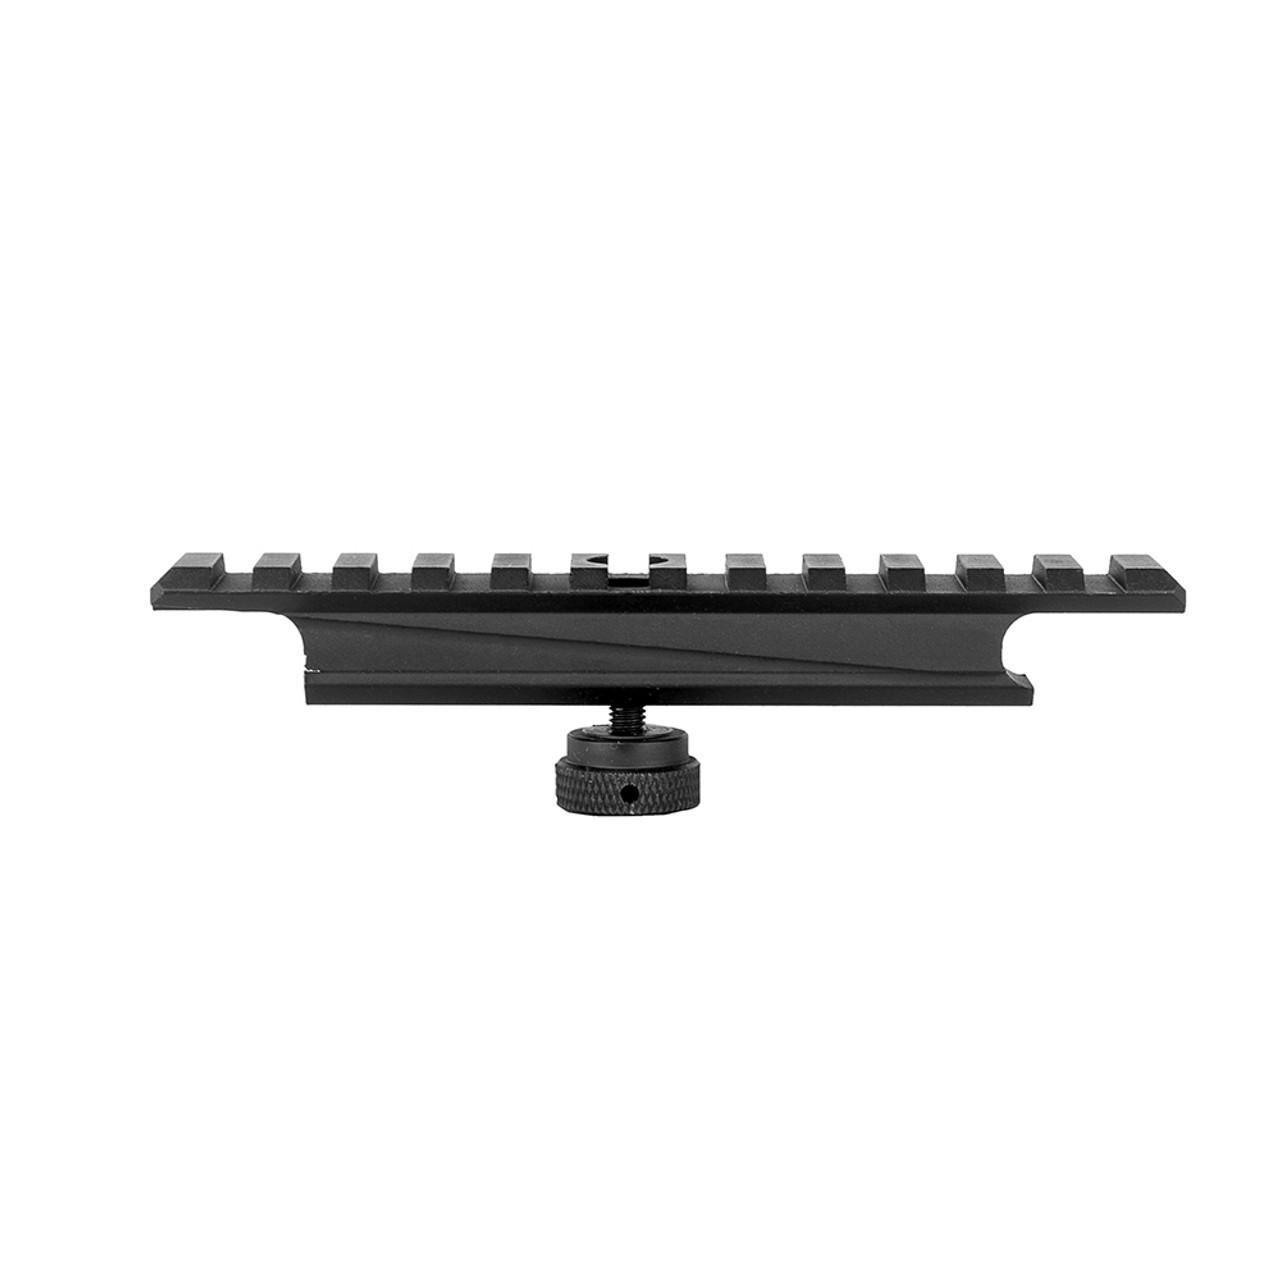 VISM AR Carry Handle - Picatinny rail NEW (MAR6M2)